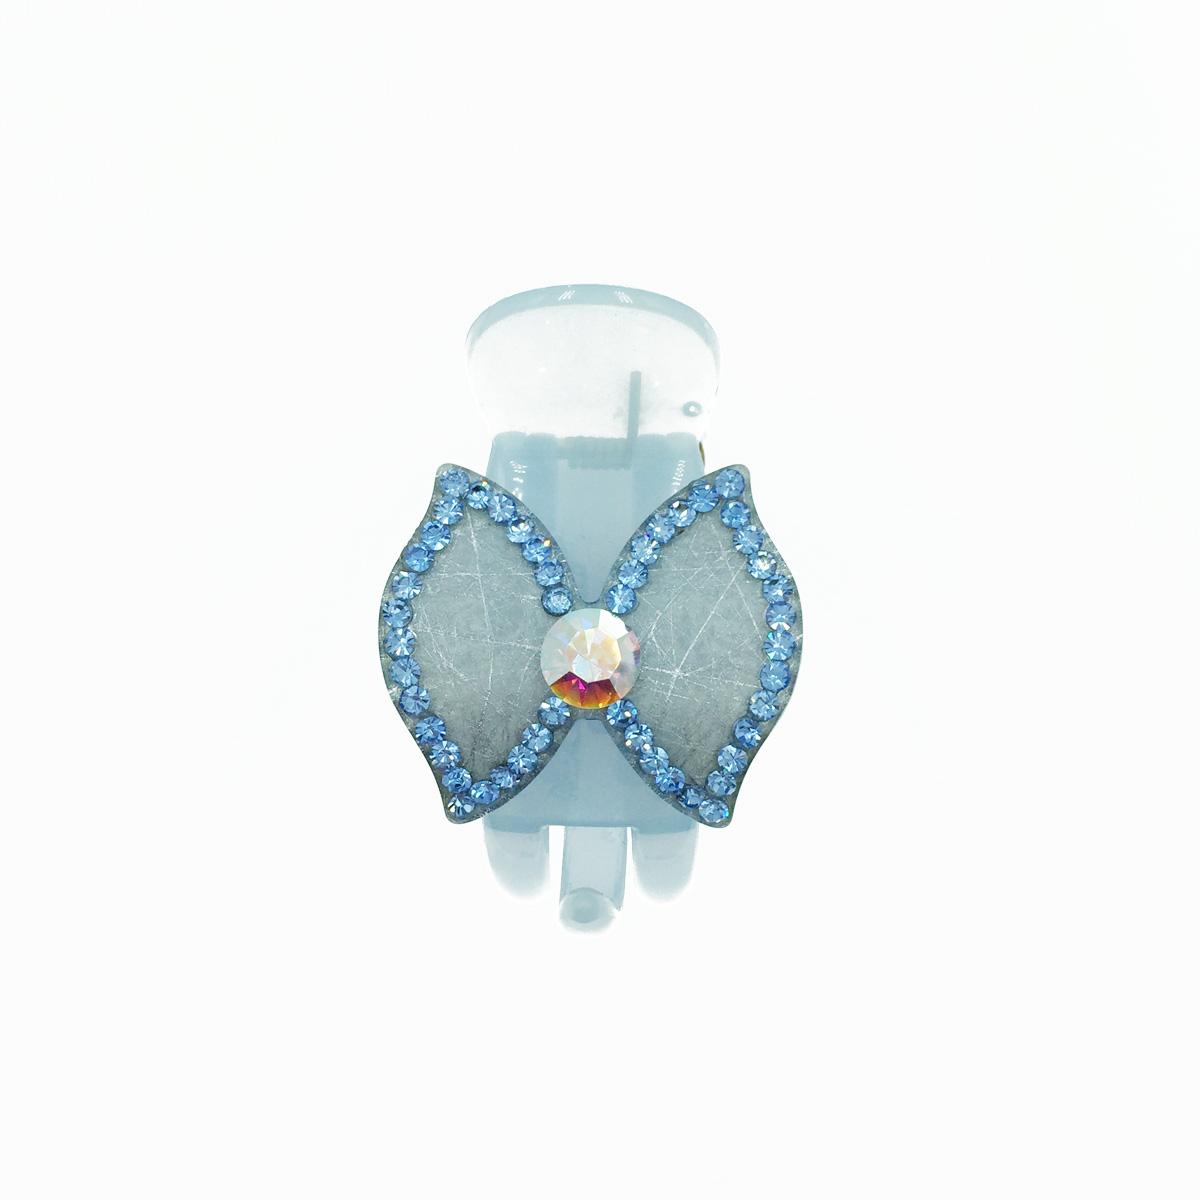 蝴蝶結 水鑽 藍色 瀏海夾 髮夾 法國夾 小鯊魚夾 採用施華洛世奇水晶元素 Crystals from Swarovski